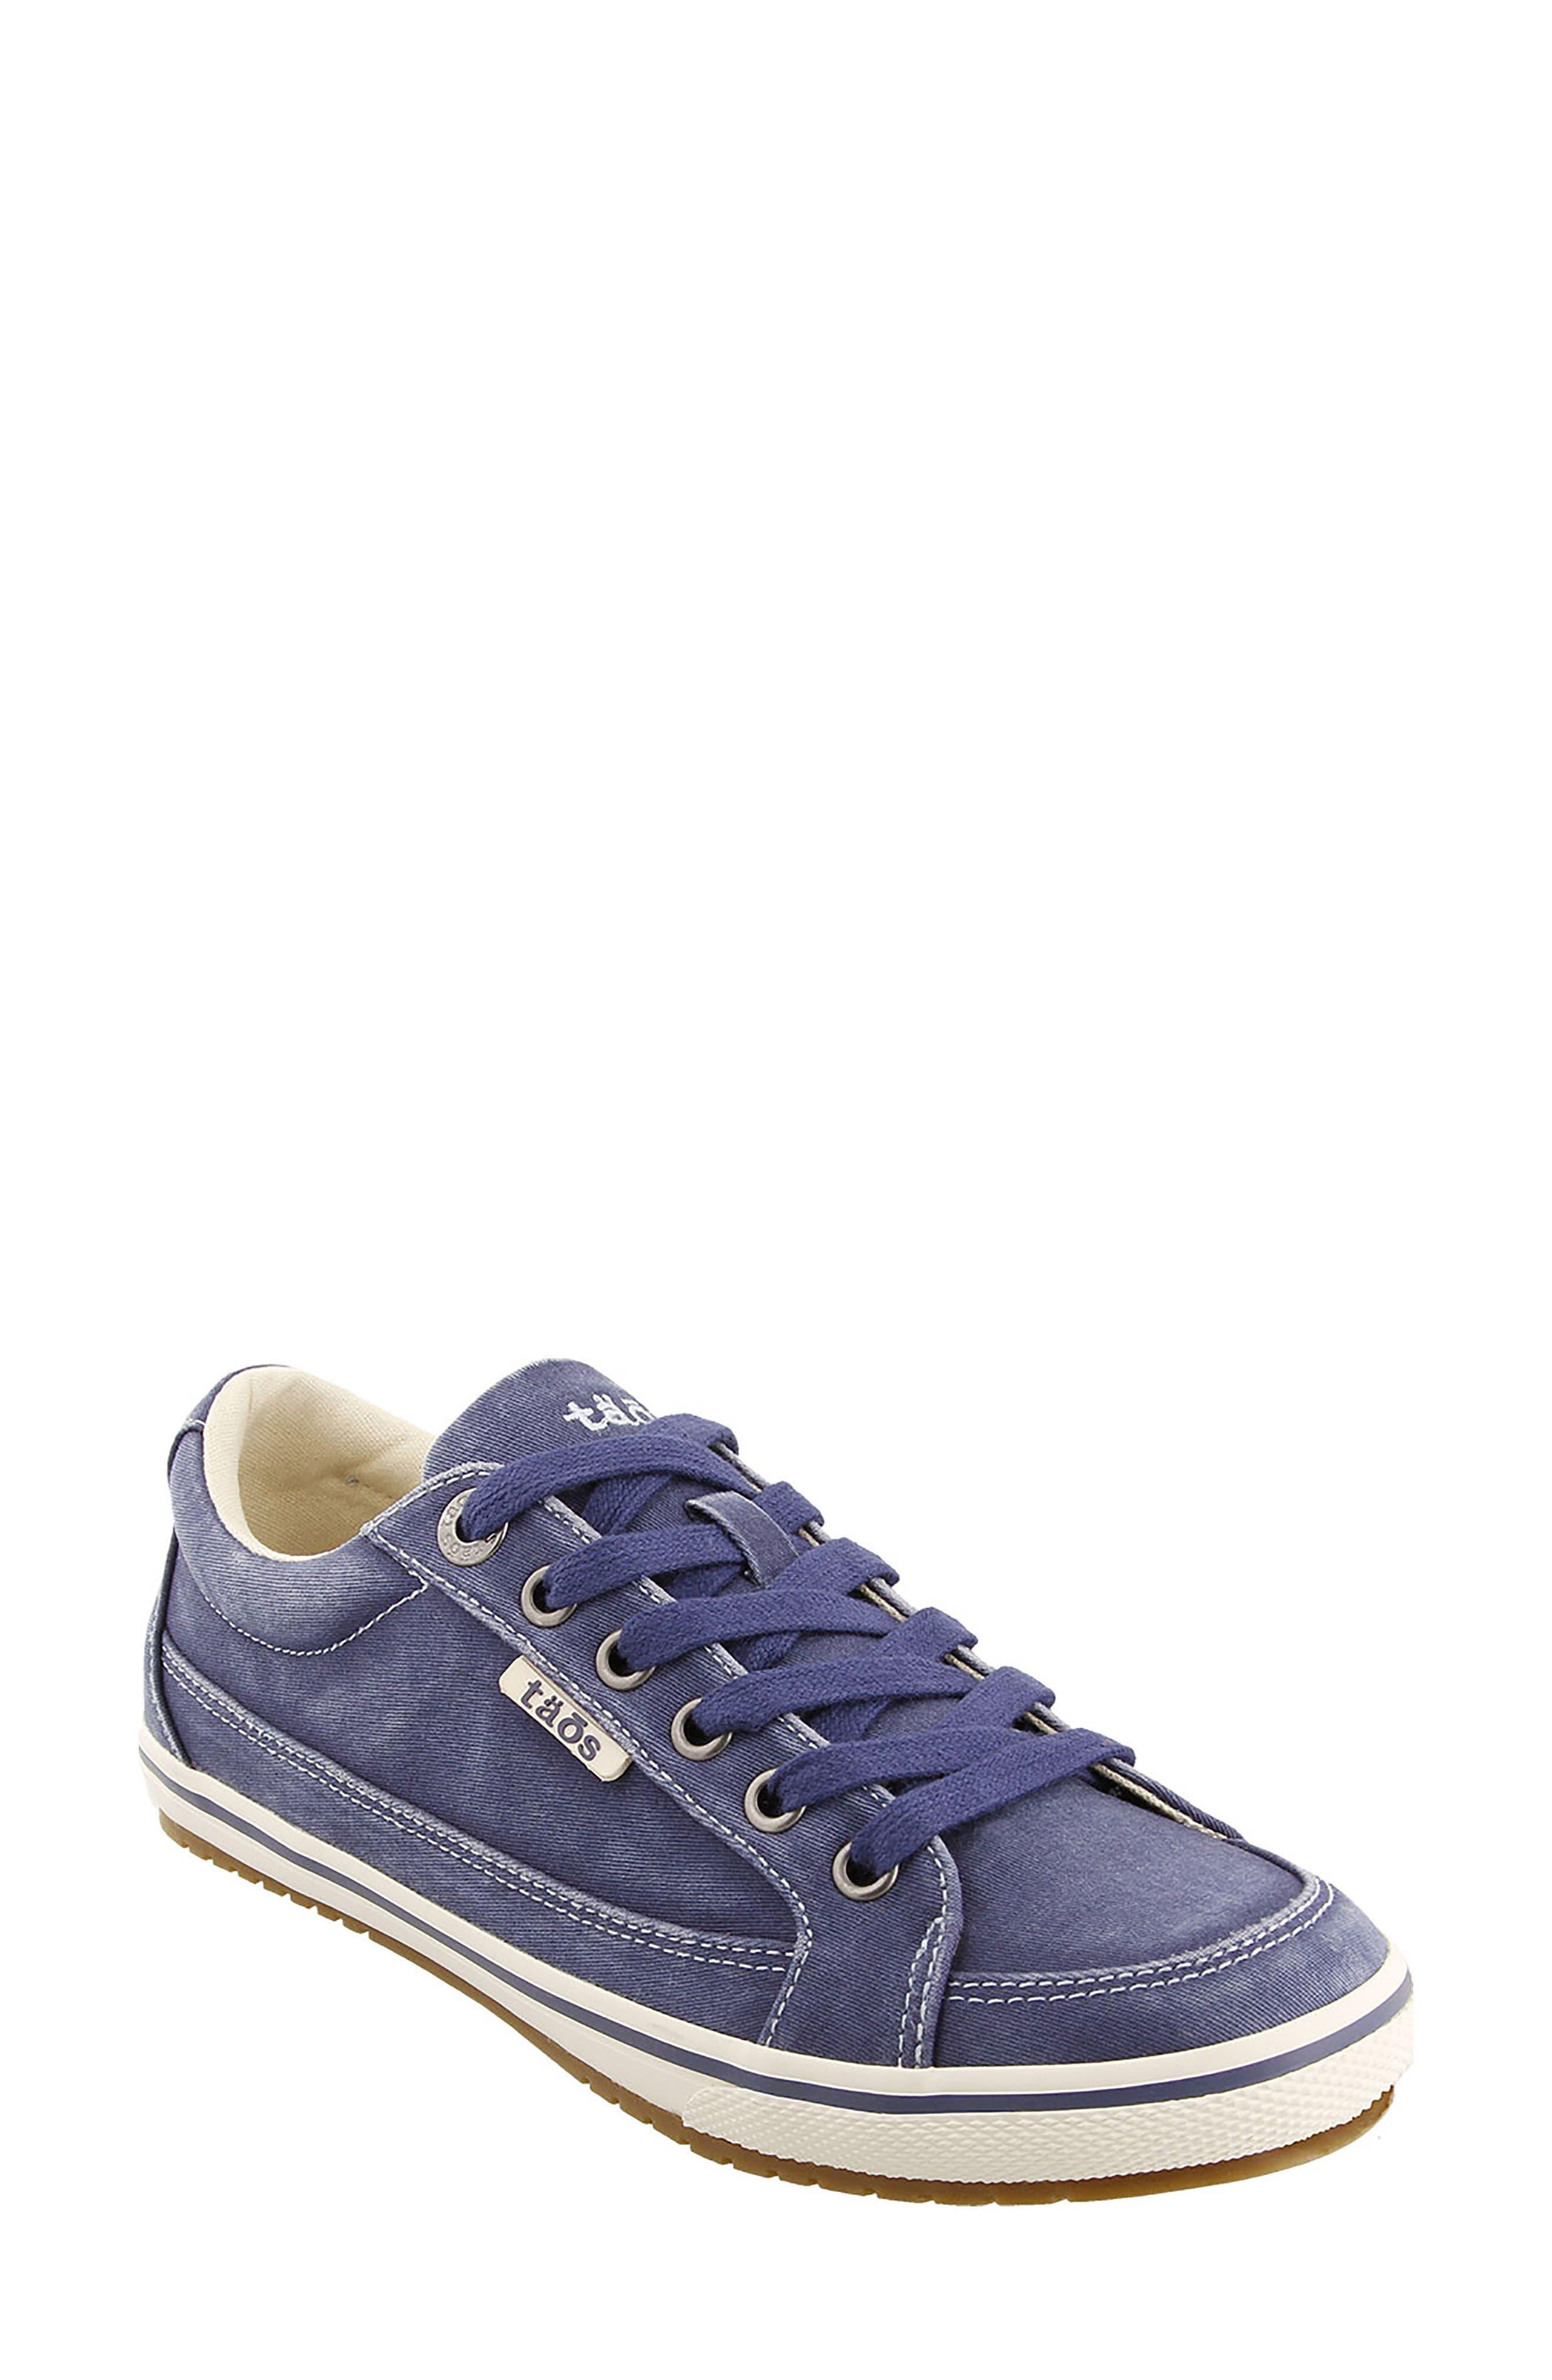 Taos Moc Star Sneaker (Women)